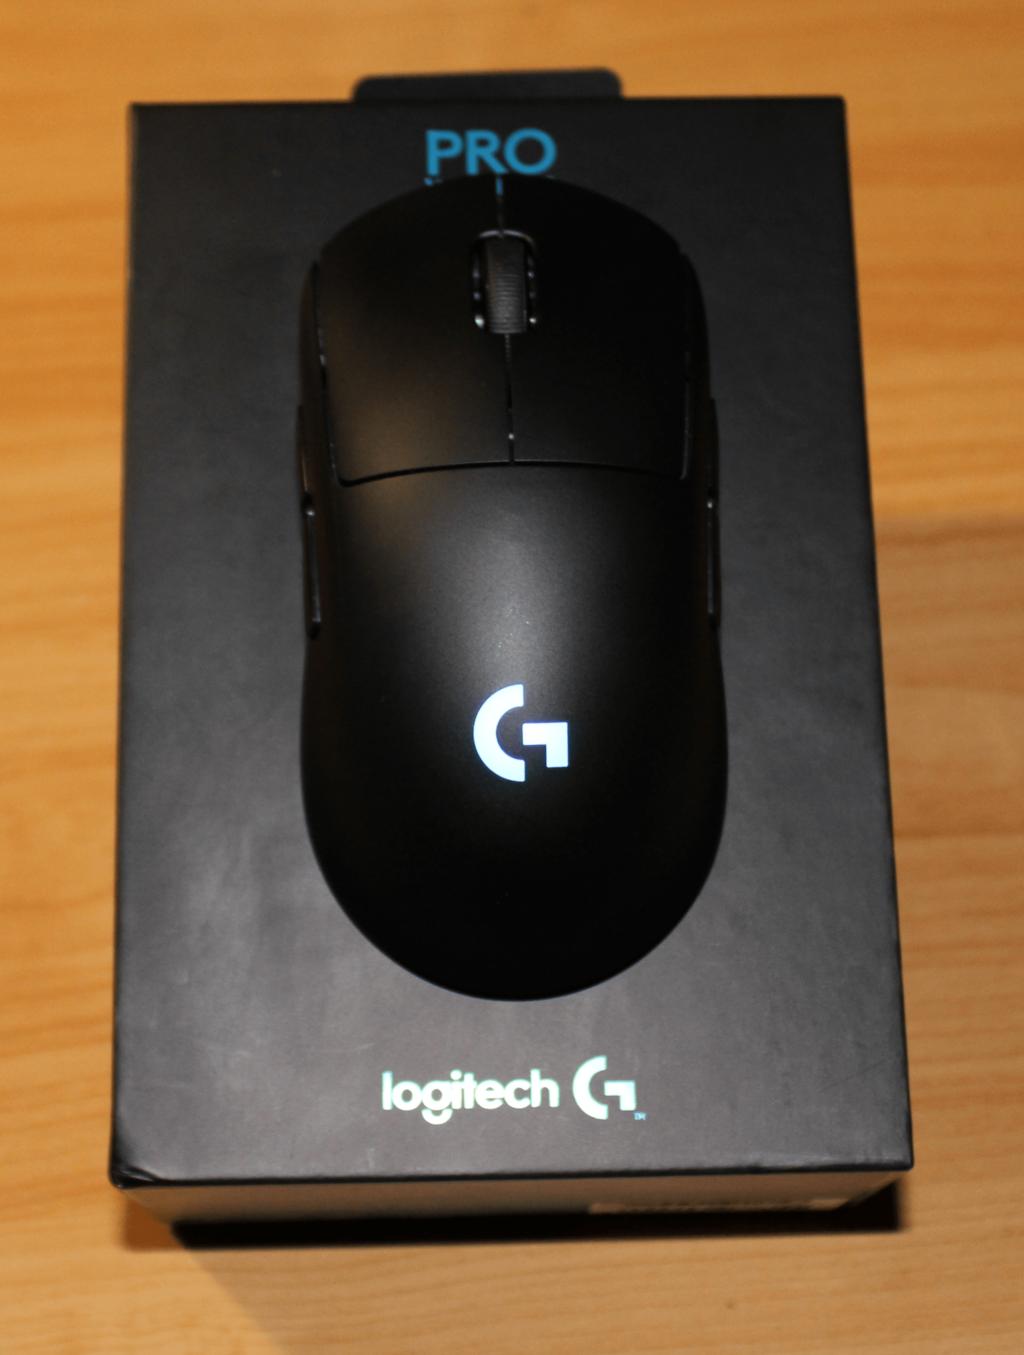 Logitech Pro Wireless auf dem Karton